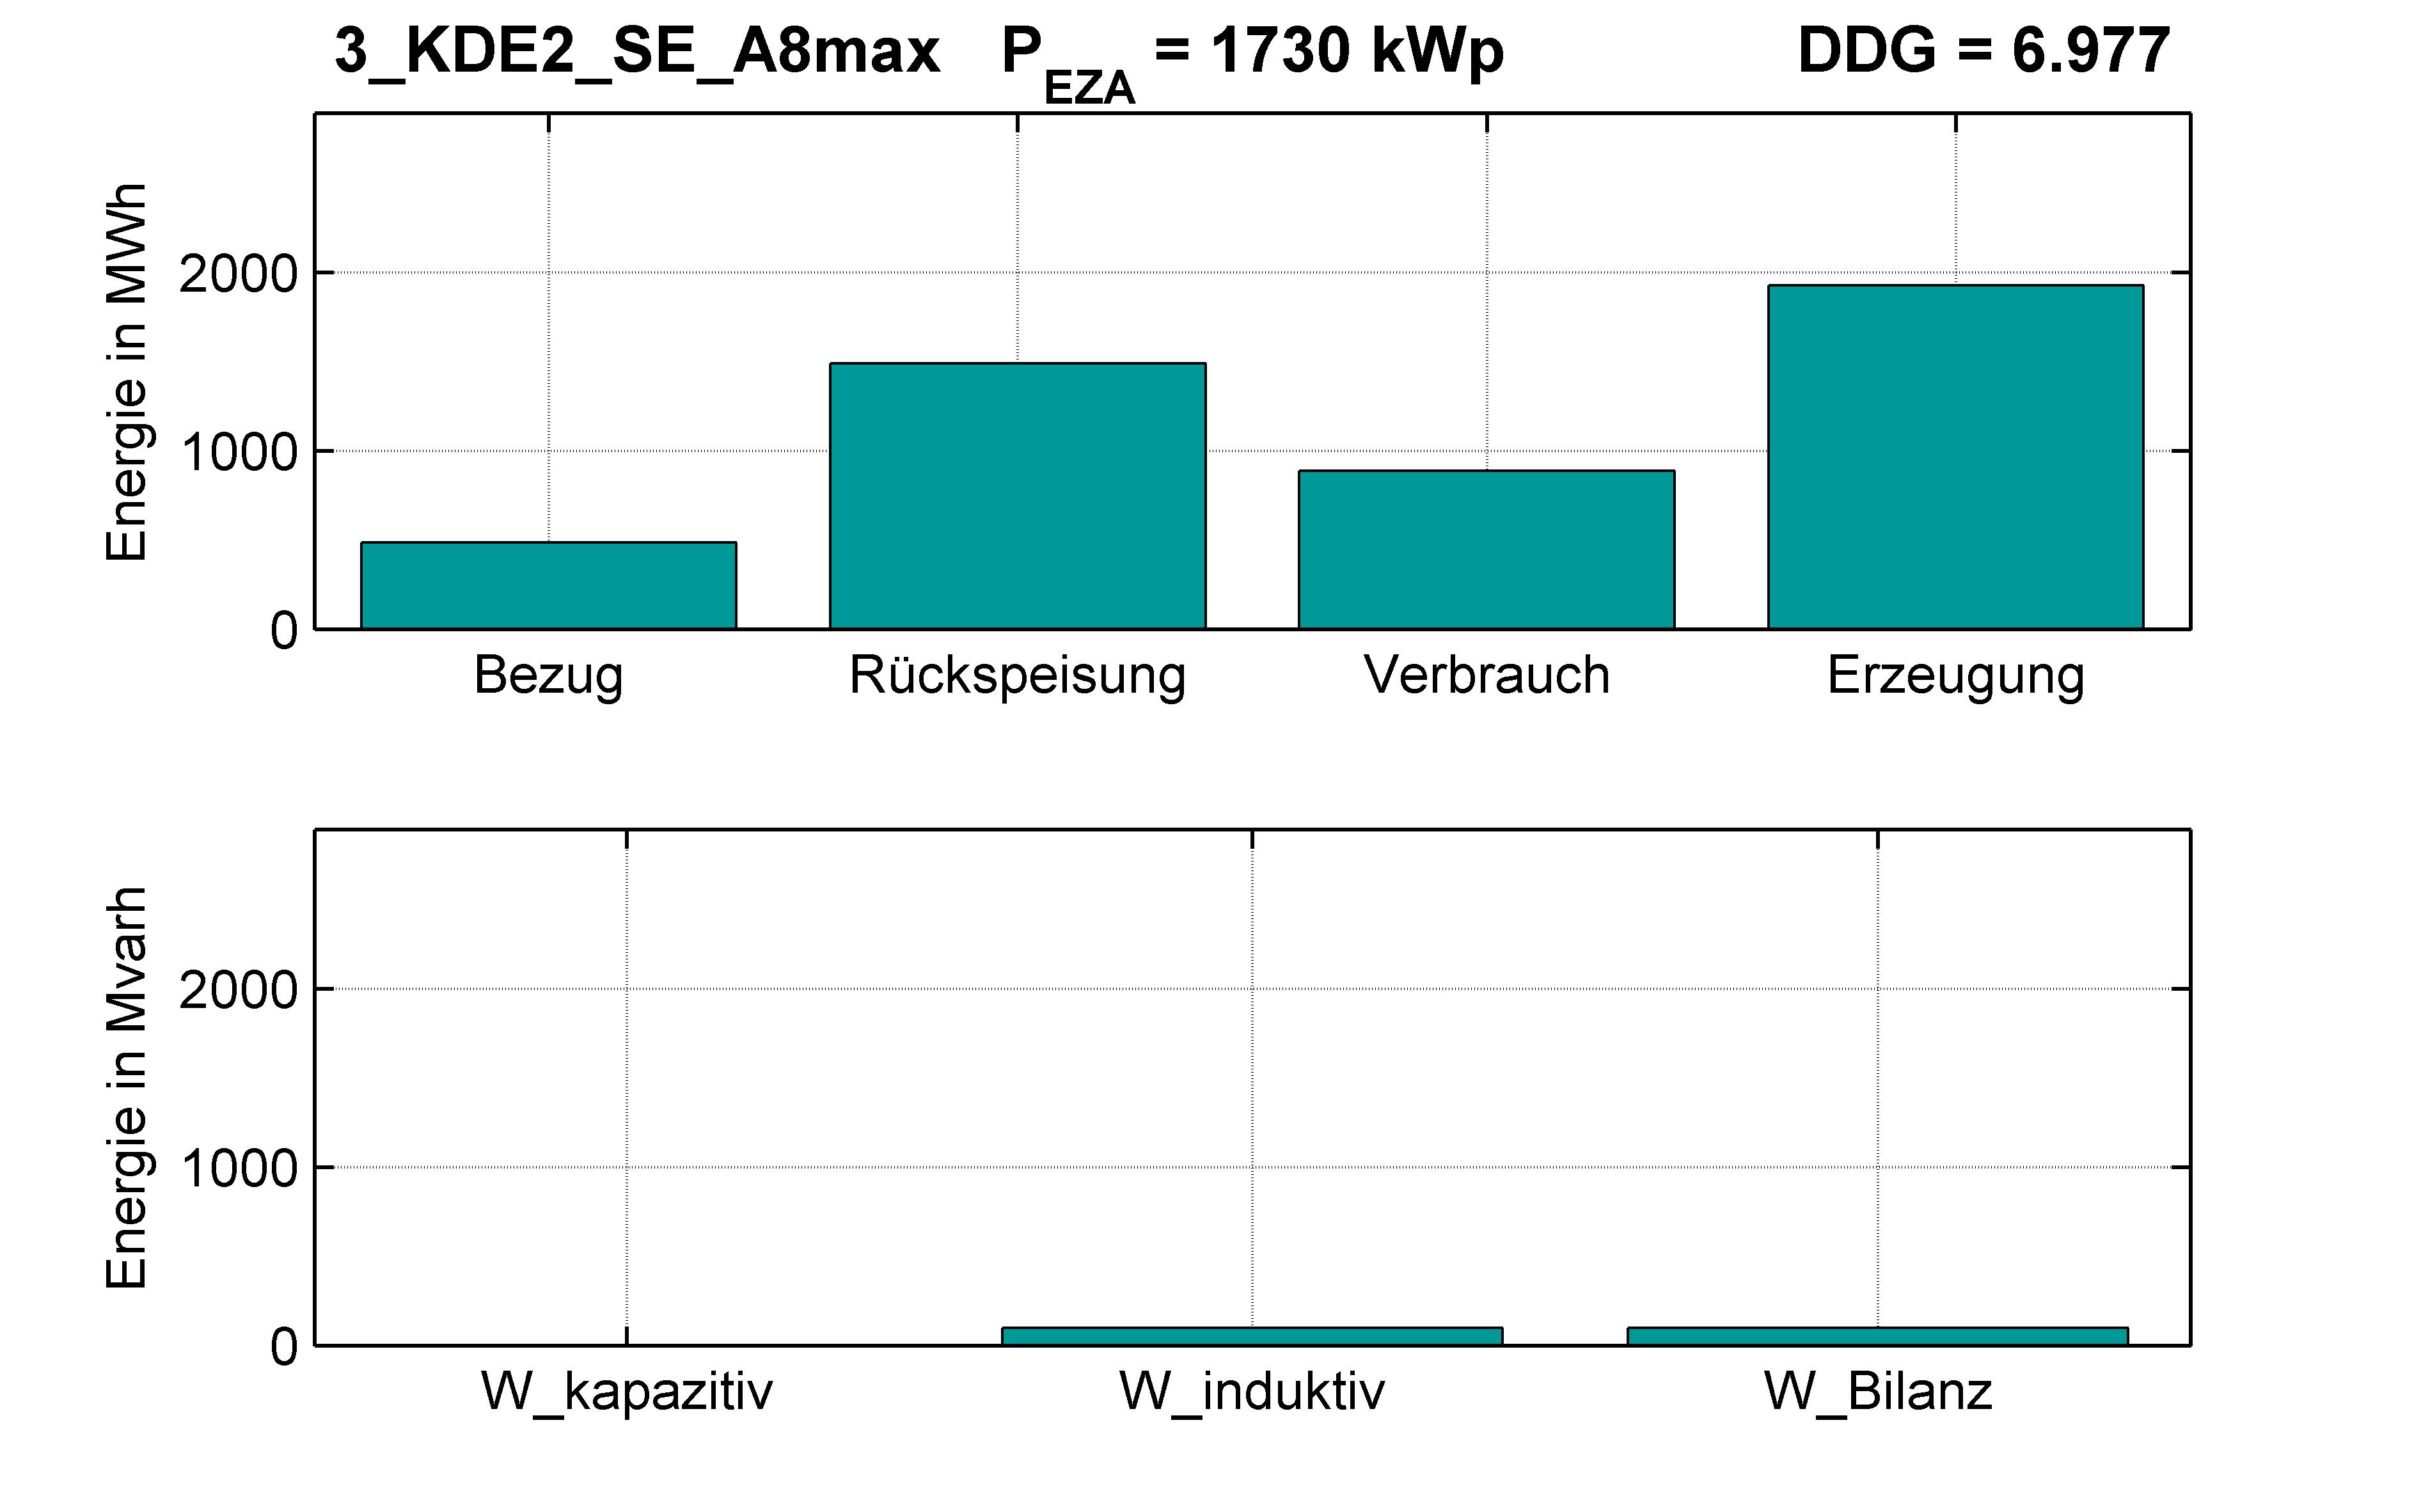 KDE2 | P-Kappung 70% (SE) A8max | PQ-Bilanz